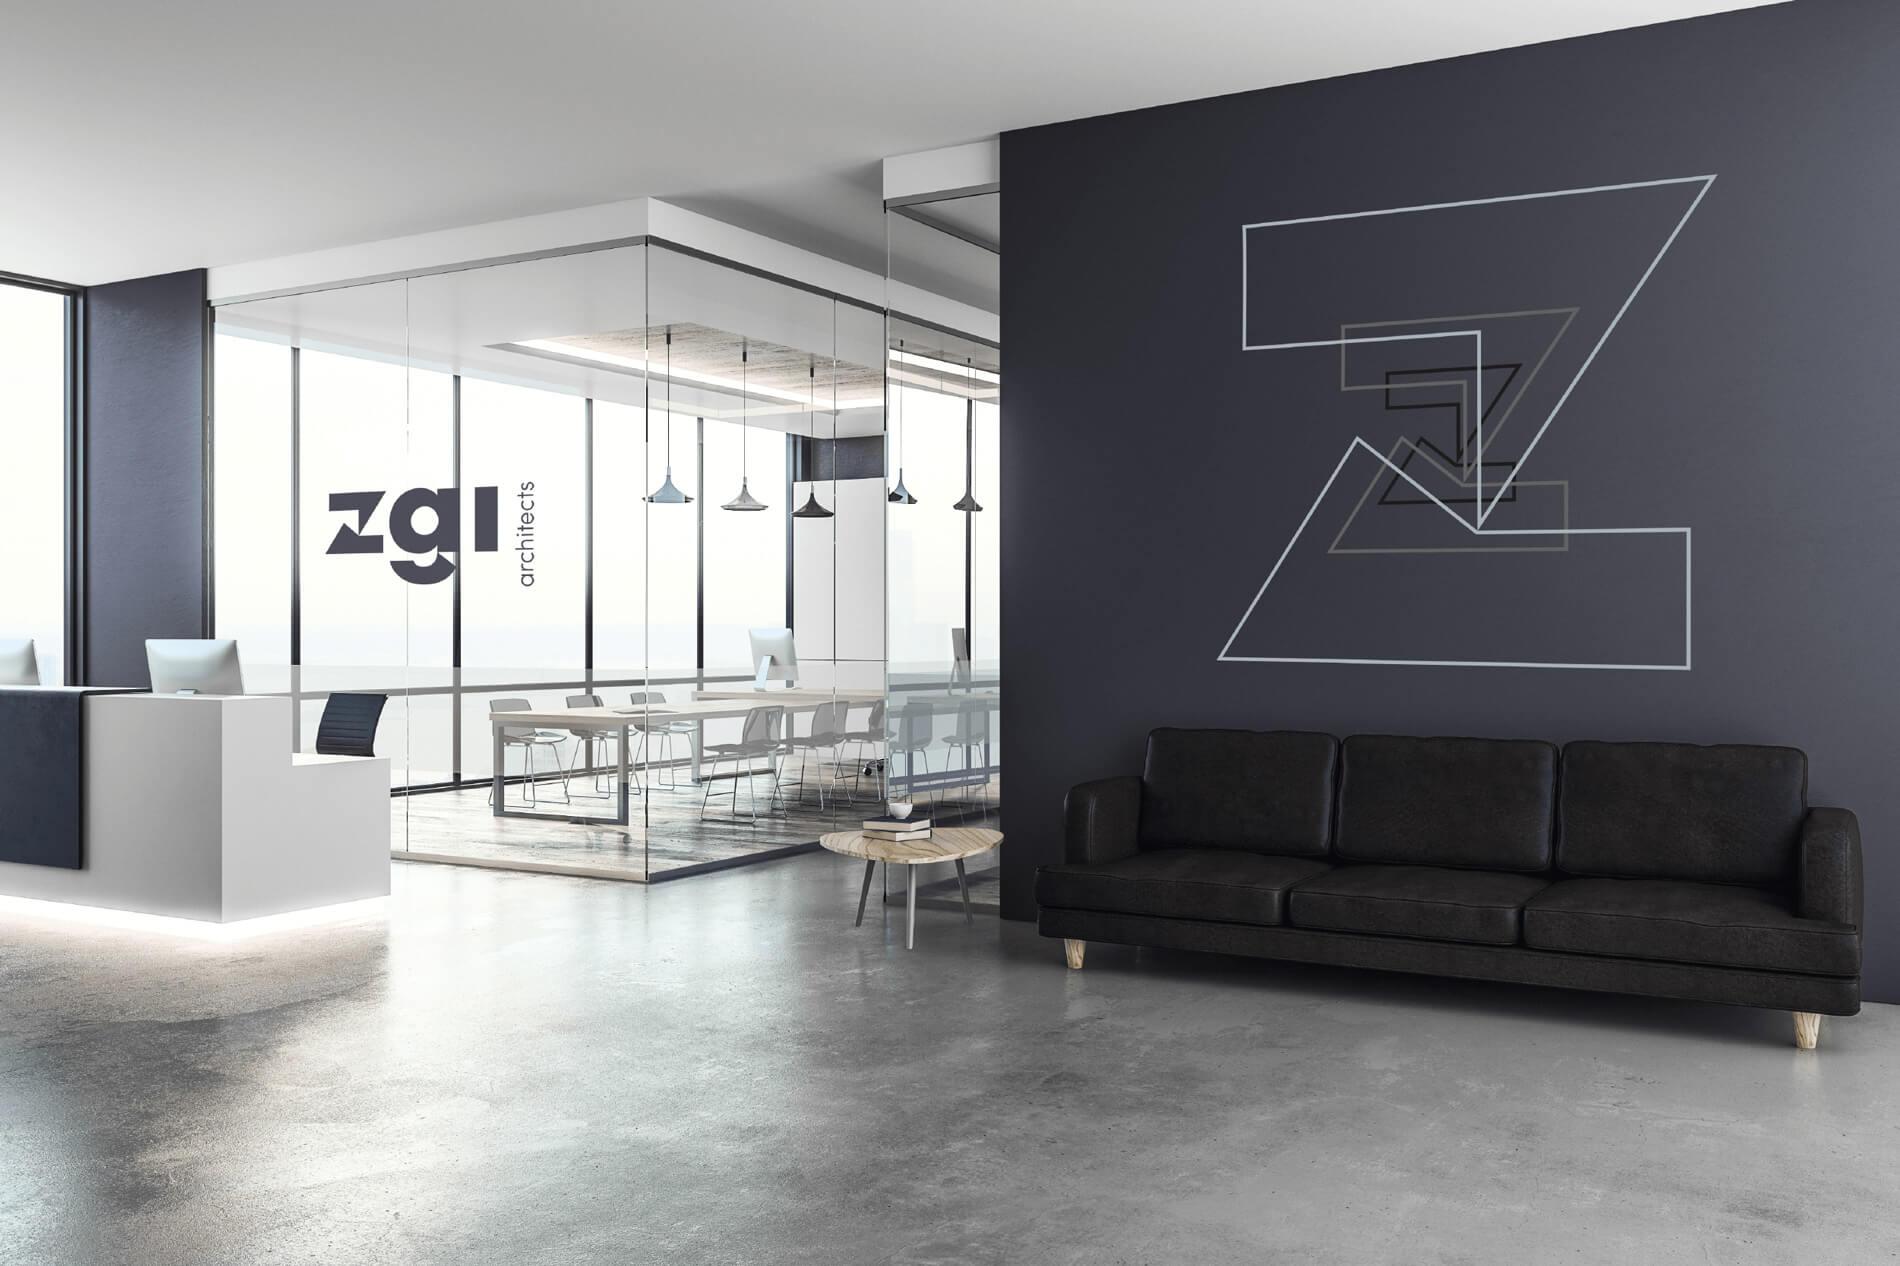 zgi-reception.jpg